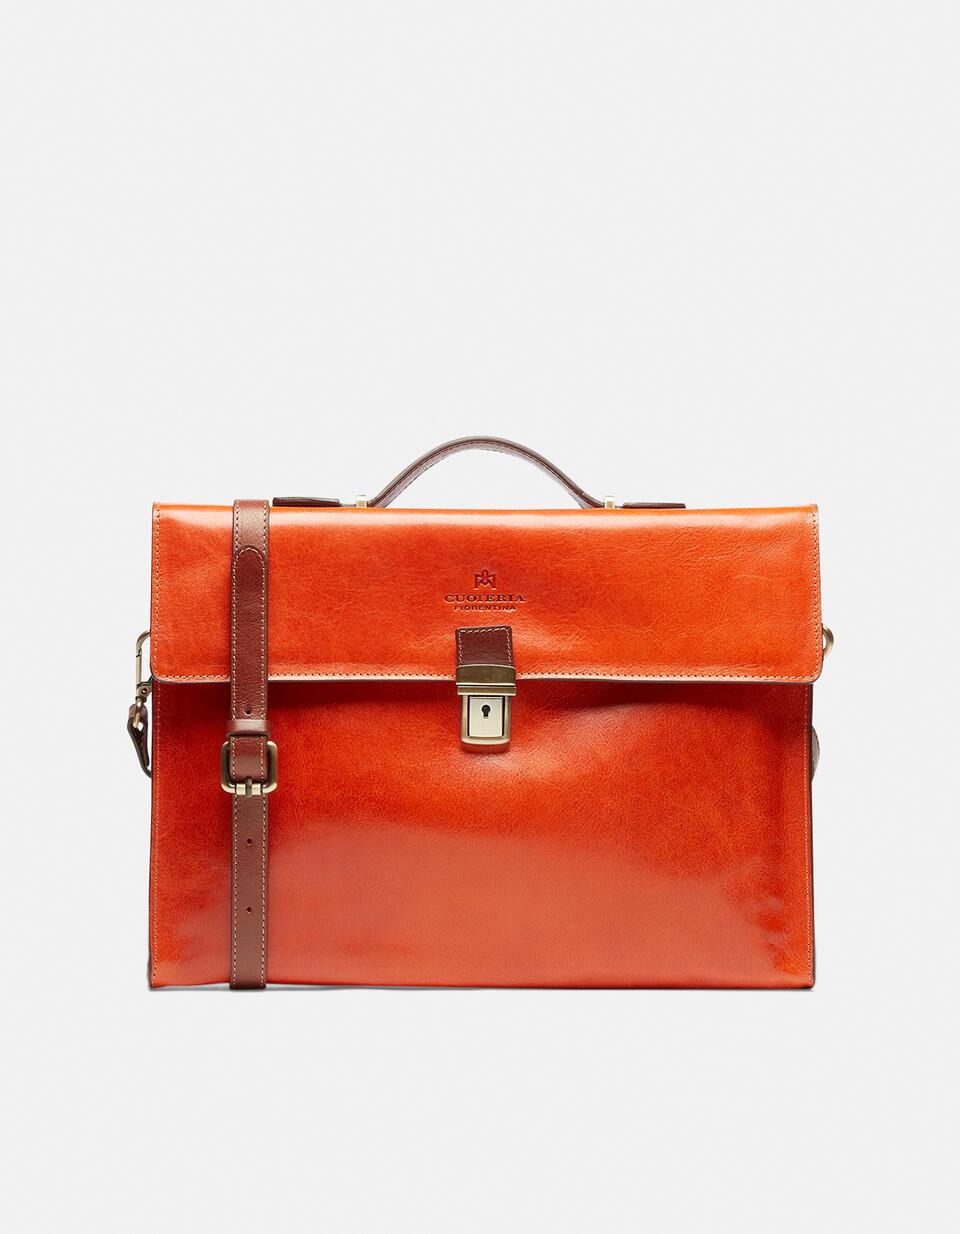 Warm and Colour leather briefcase with side zips ARANCIOBICOLORE Cuoieria Fiorentina